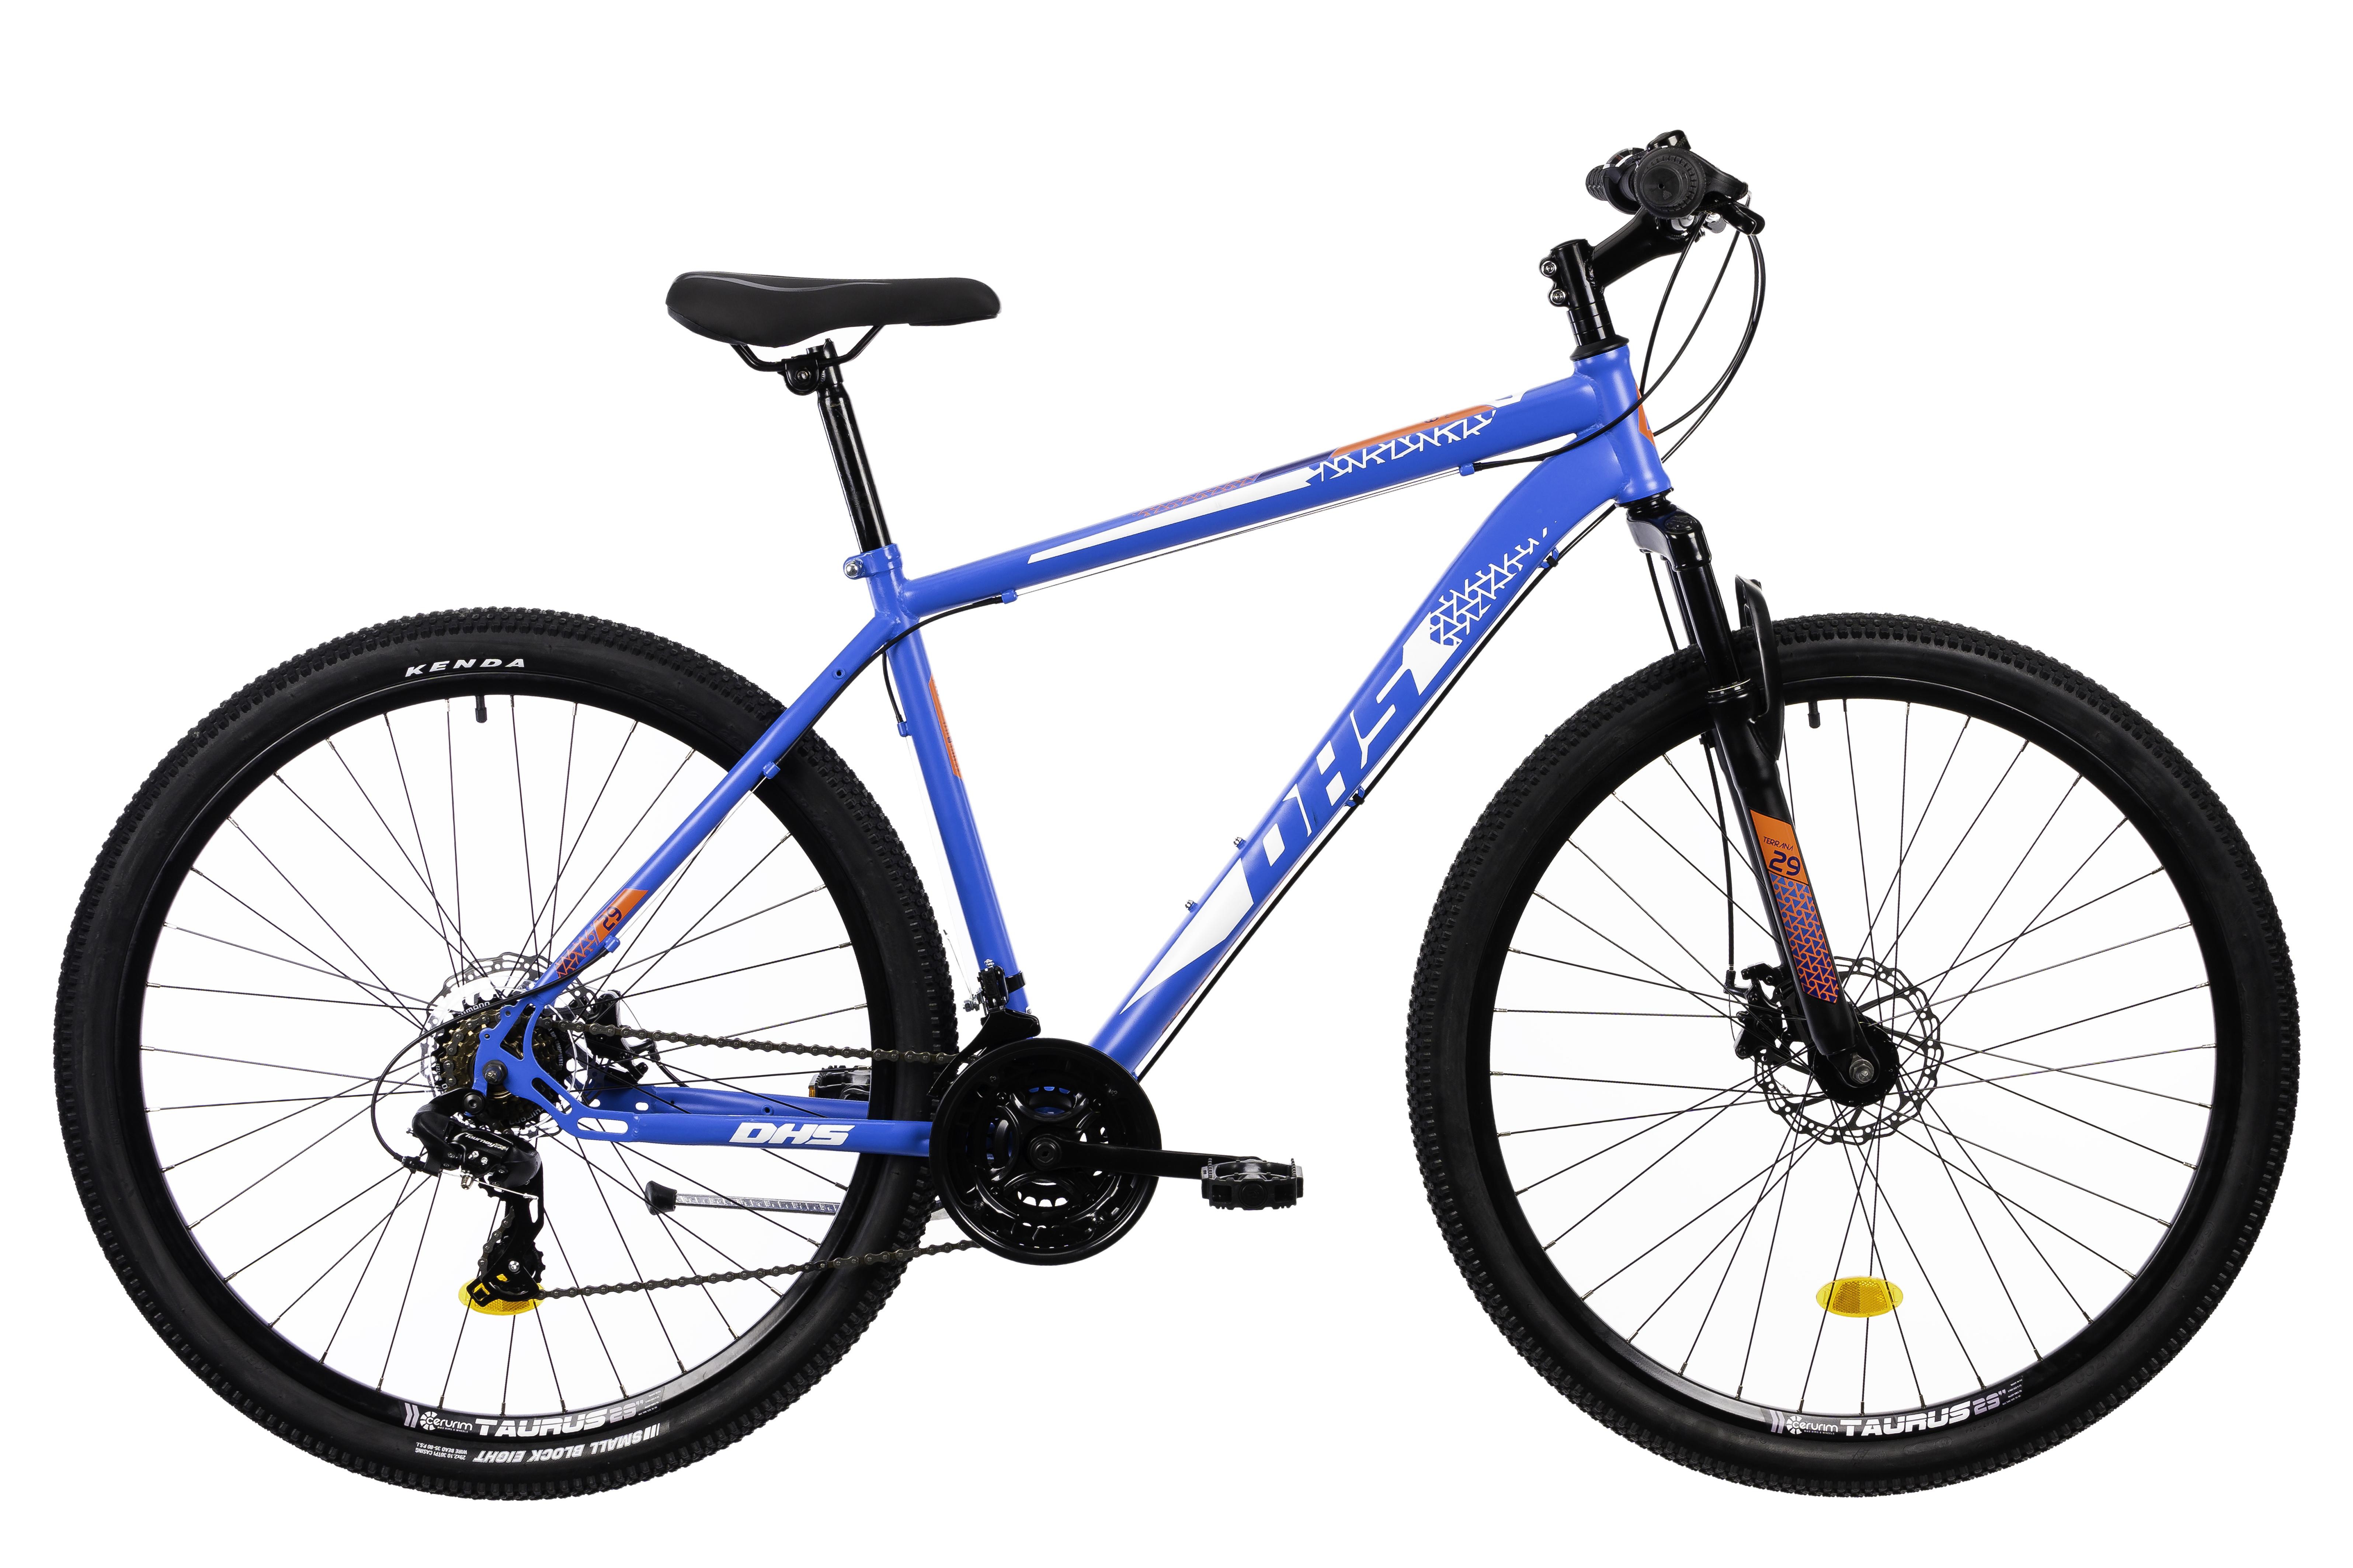 Bicicleta Mtb Terrana 2905 - 29 Inch, M, Gri [6]